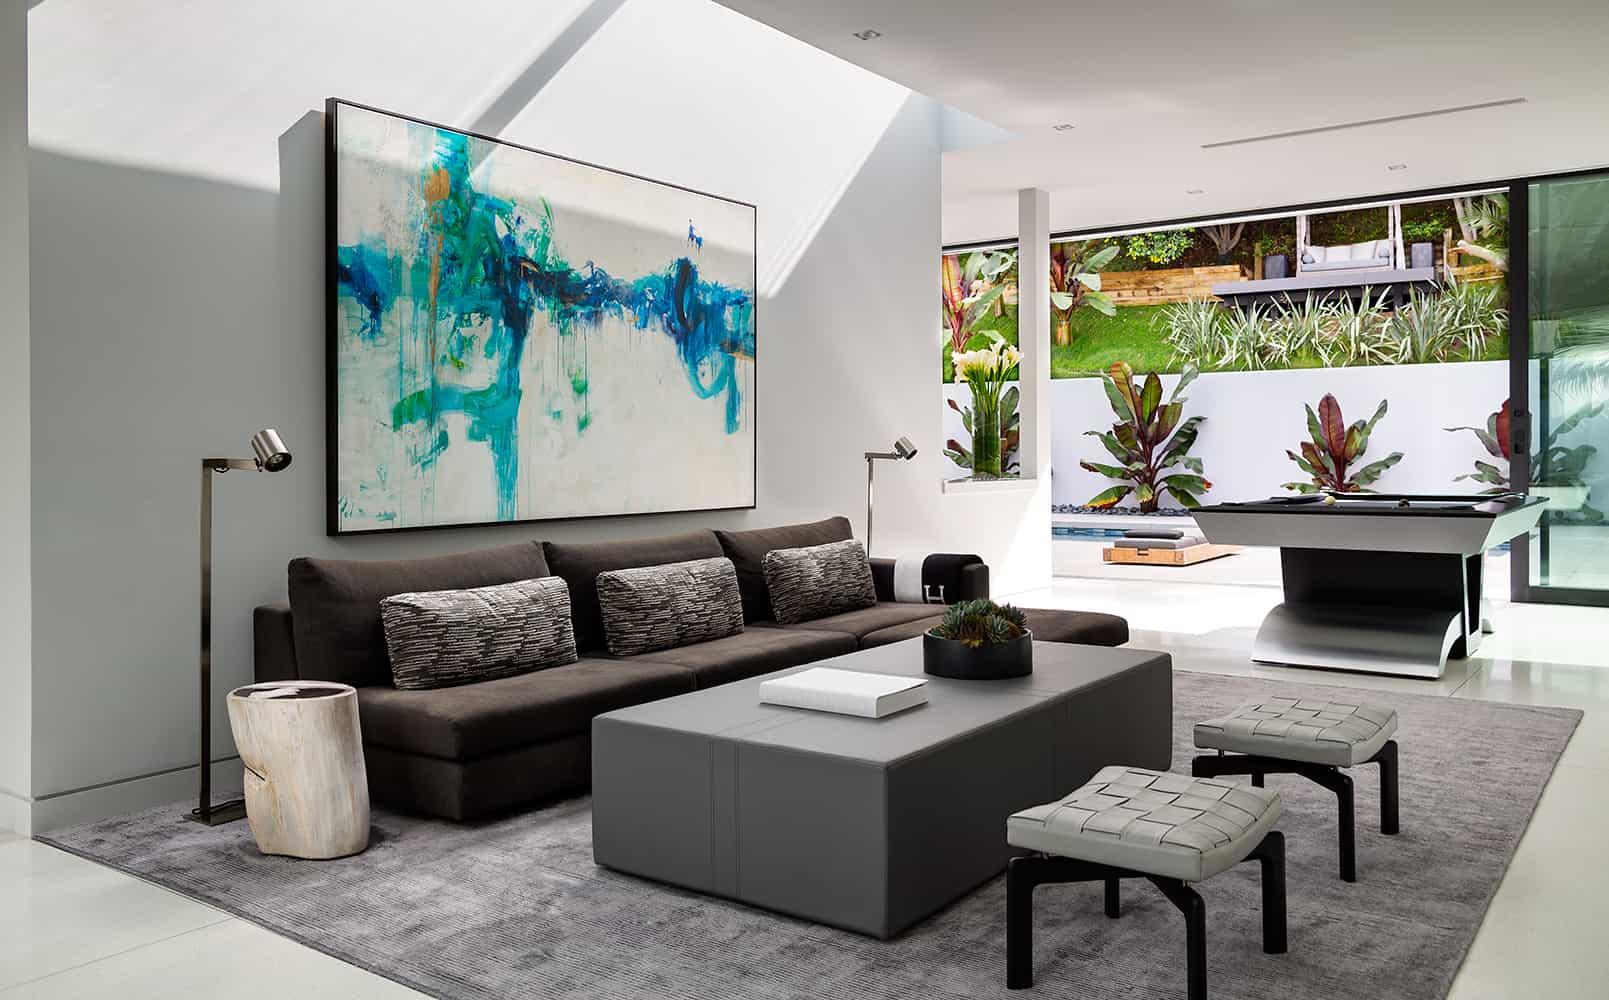 Modern-Home-Renovation-Belzberg Architects-04-1 Kindesign